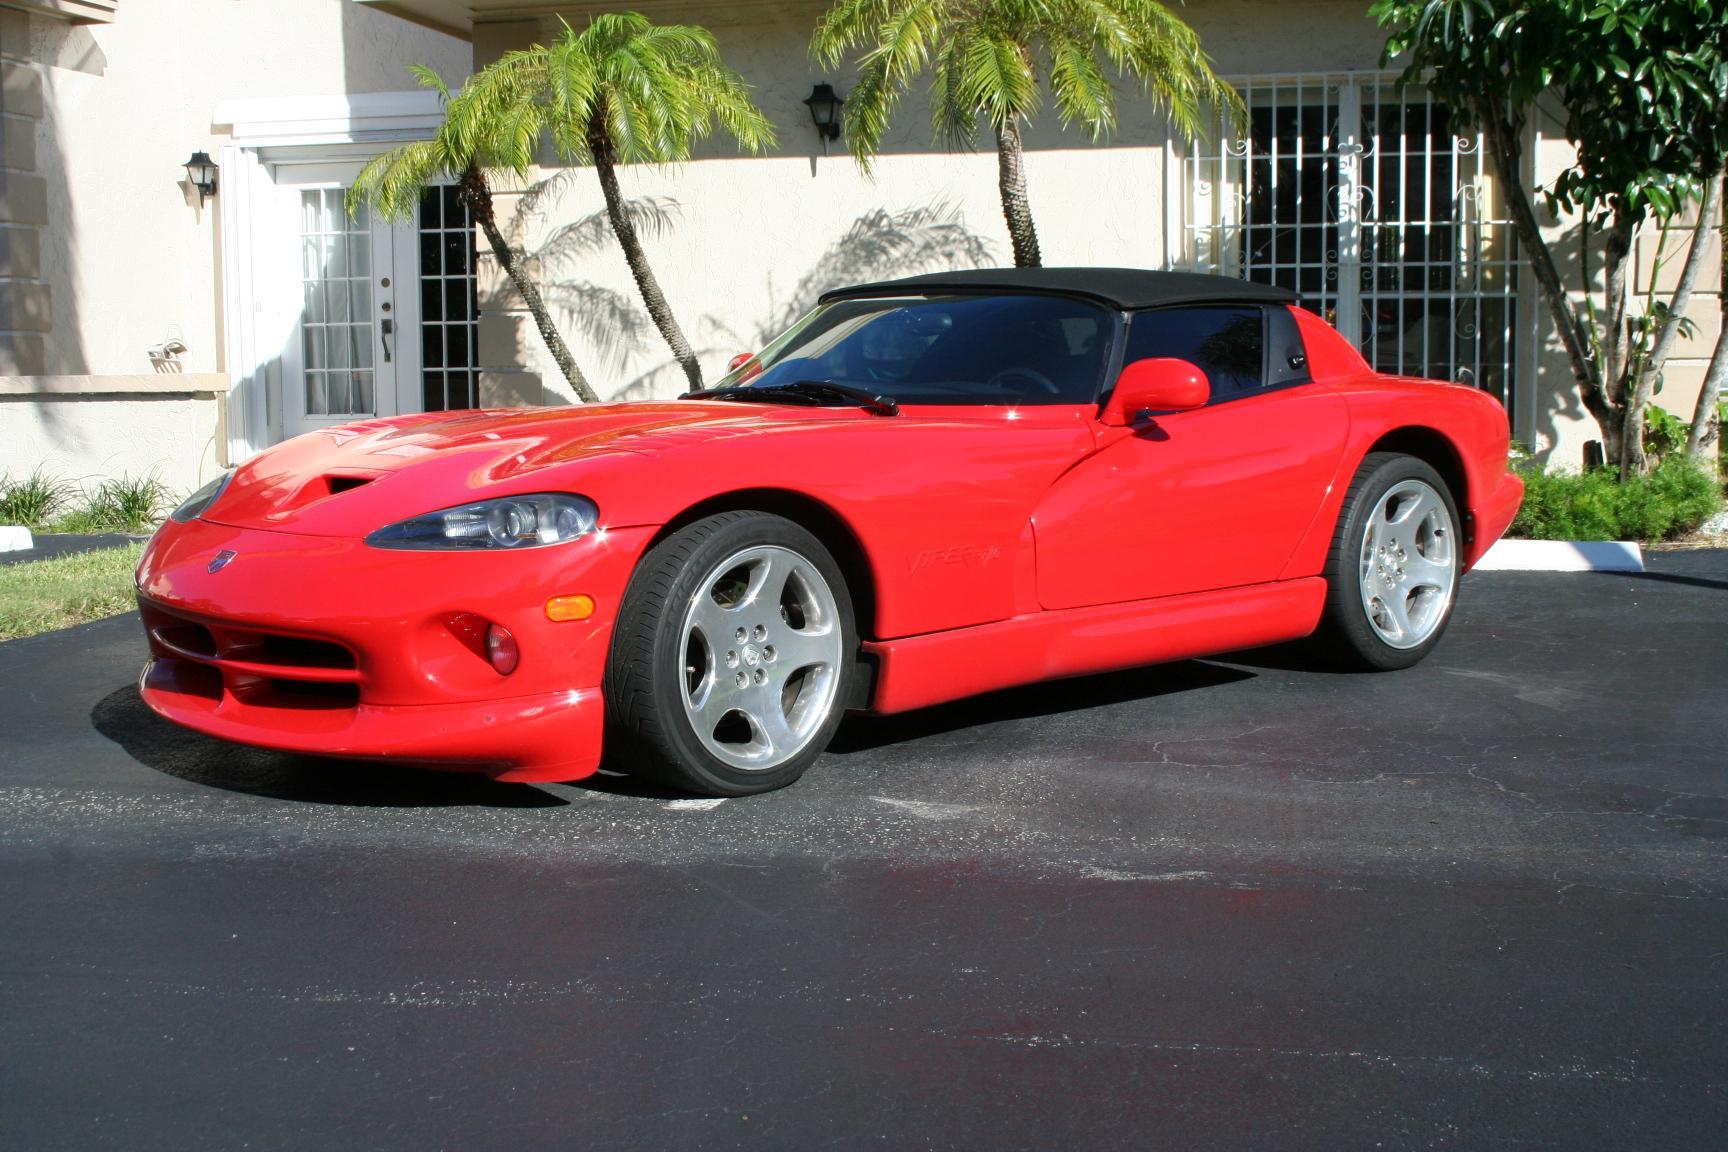 South Florida Auto Appraisers